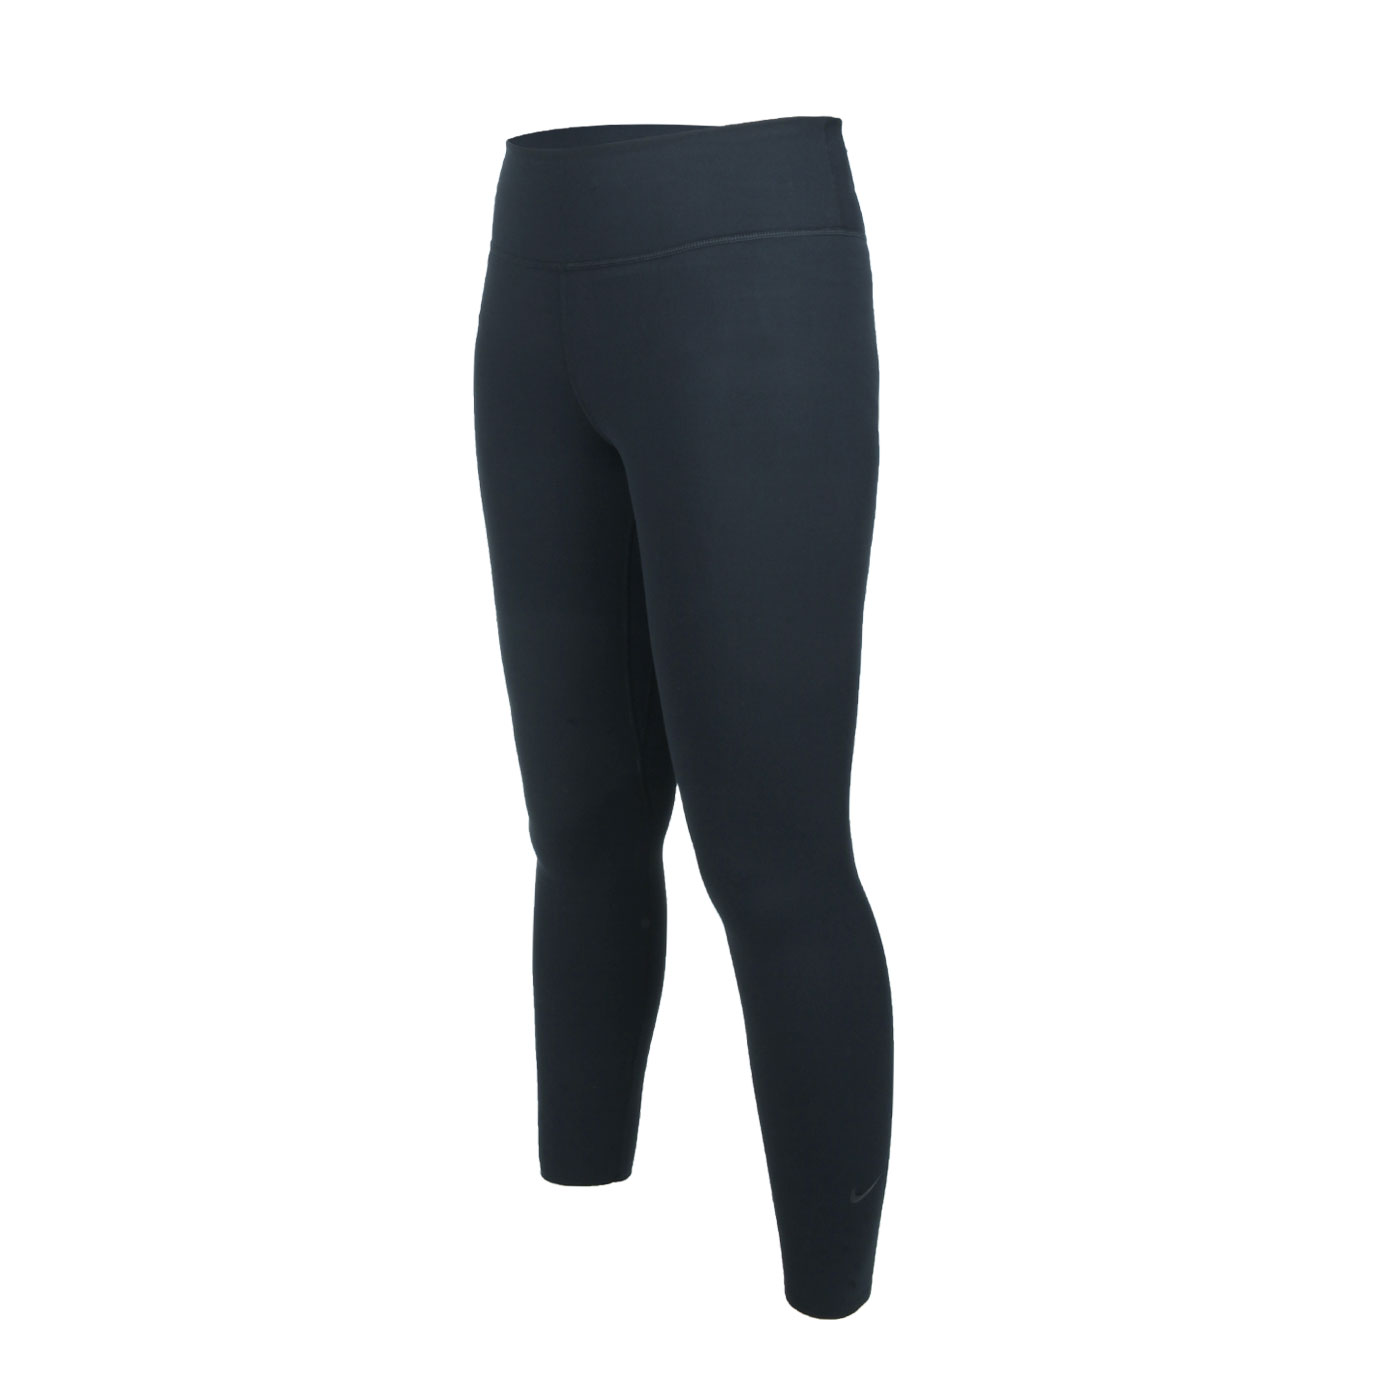 NIKE 女款緊身長褲 BQ9995-010 - 黑白